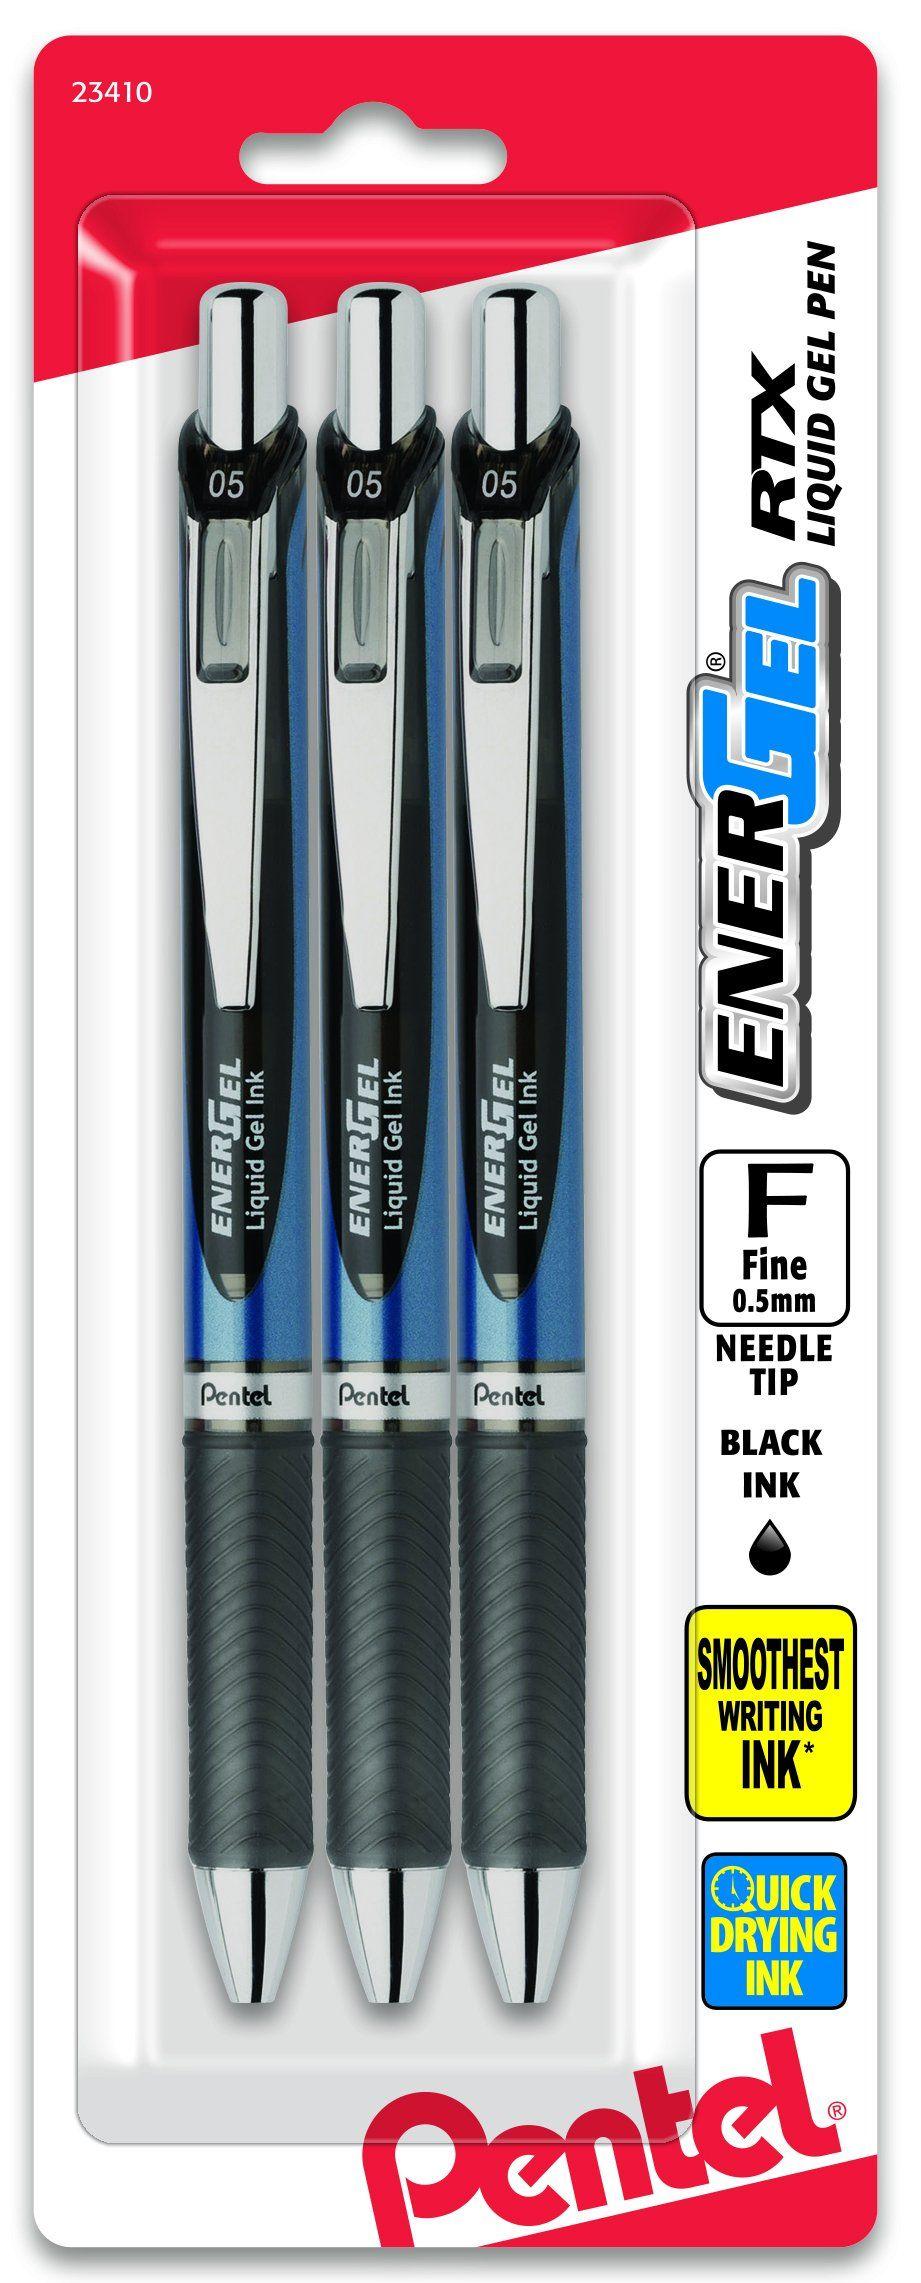 Medium Point 0.7mm Assorted Ink 3//Pack Pentel EnerGel Deluxe RTX Gel Ink Pens